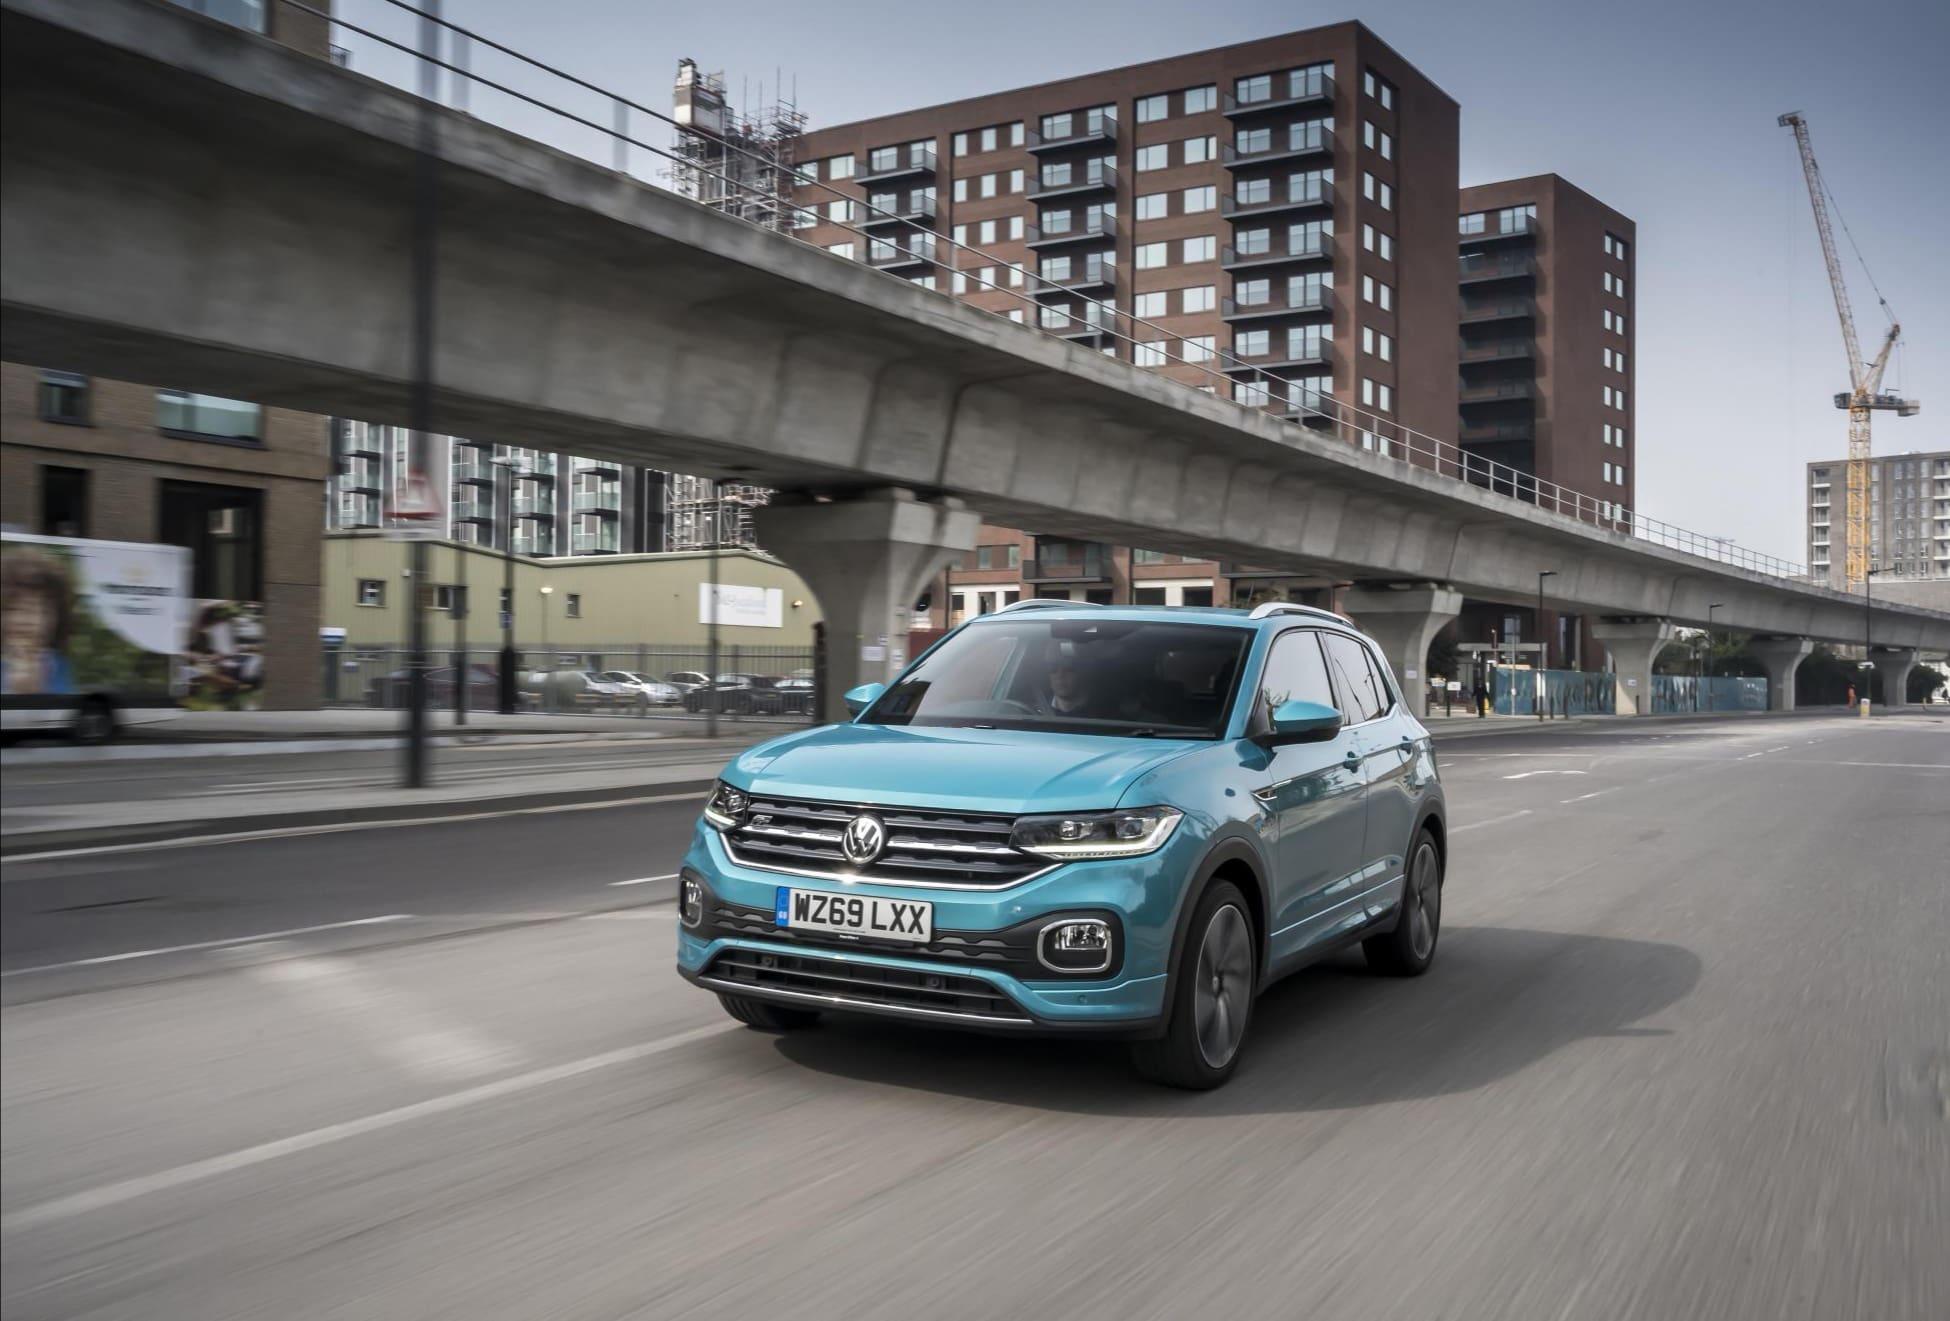 VW UK adds new T-Cross Variant